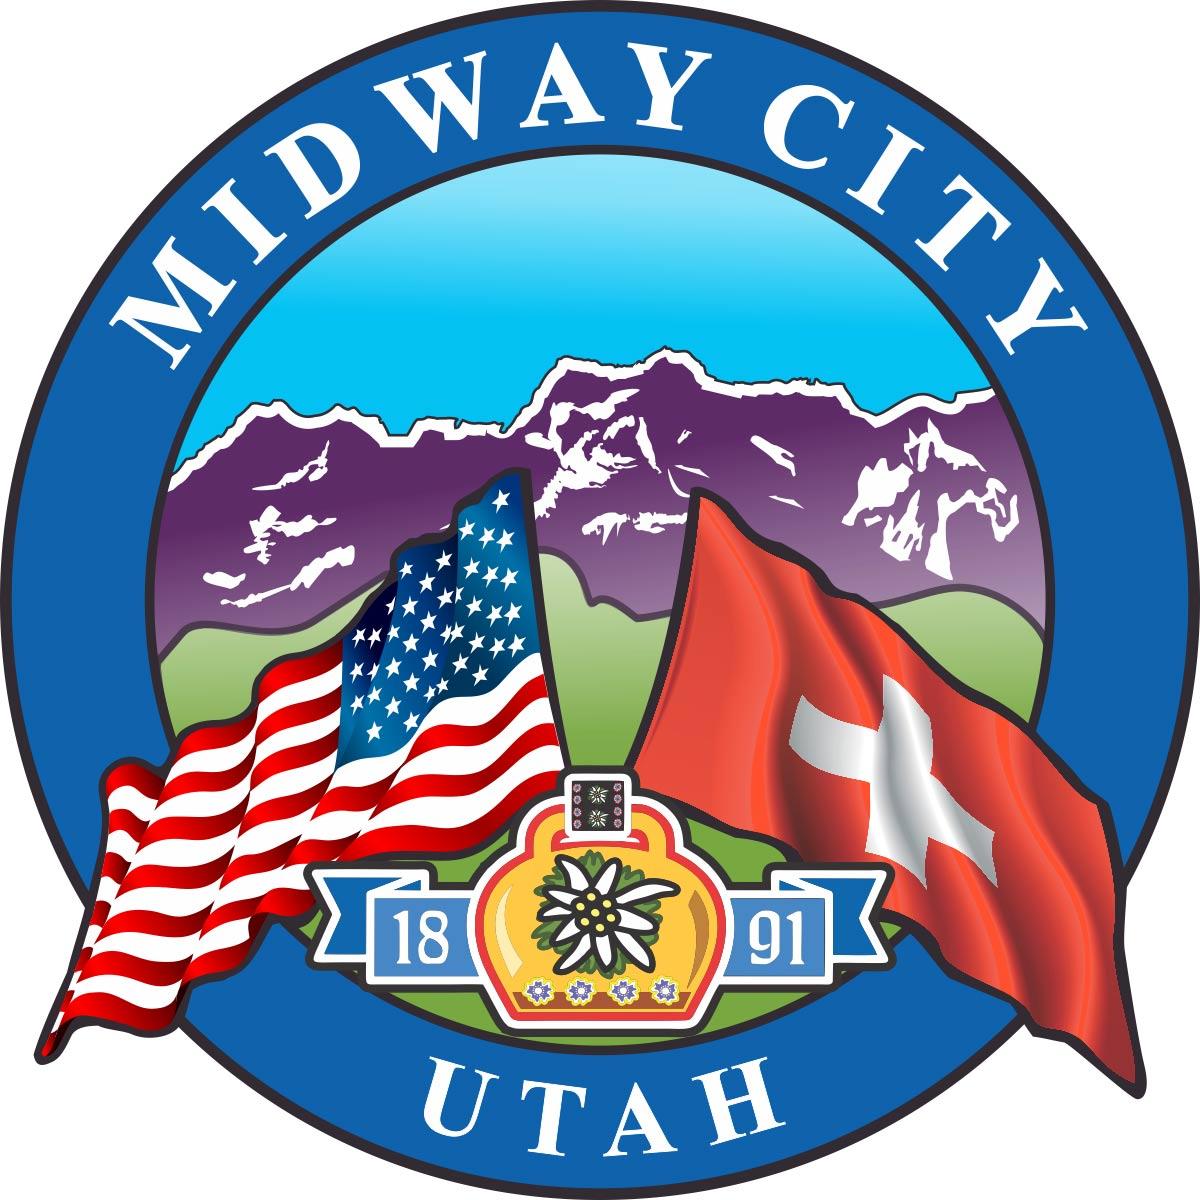 Midway City Utah